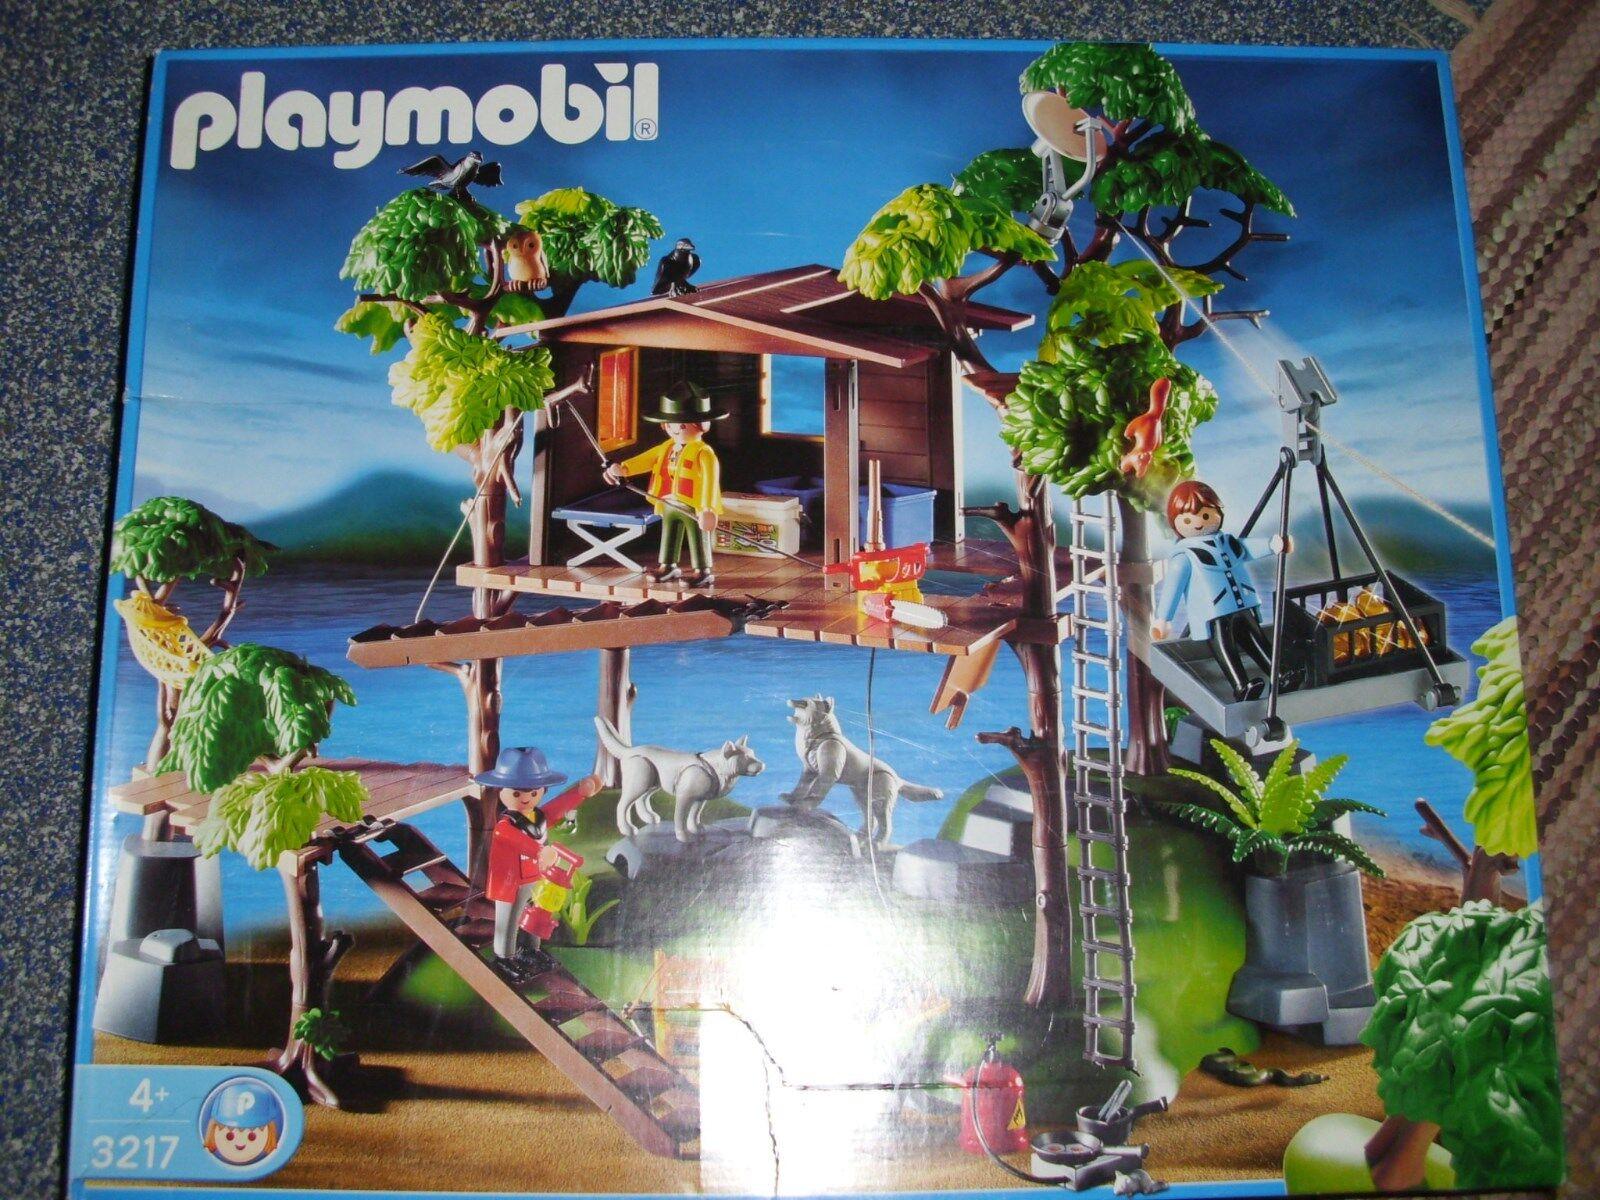 Playmobil - Baumhaus 3217 - gebraucht - top Zustand